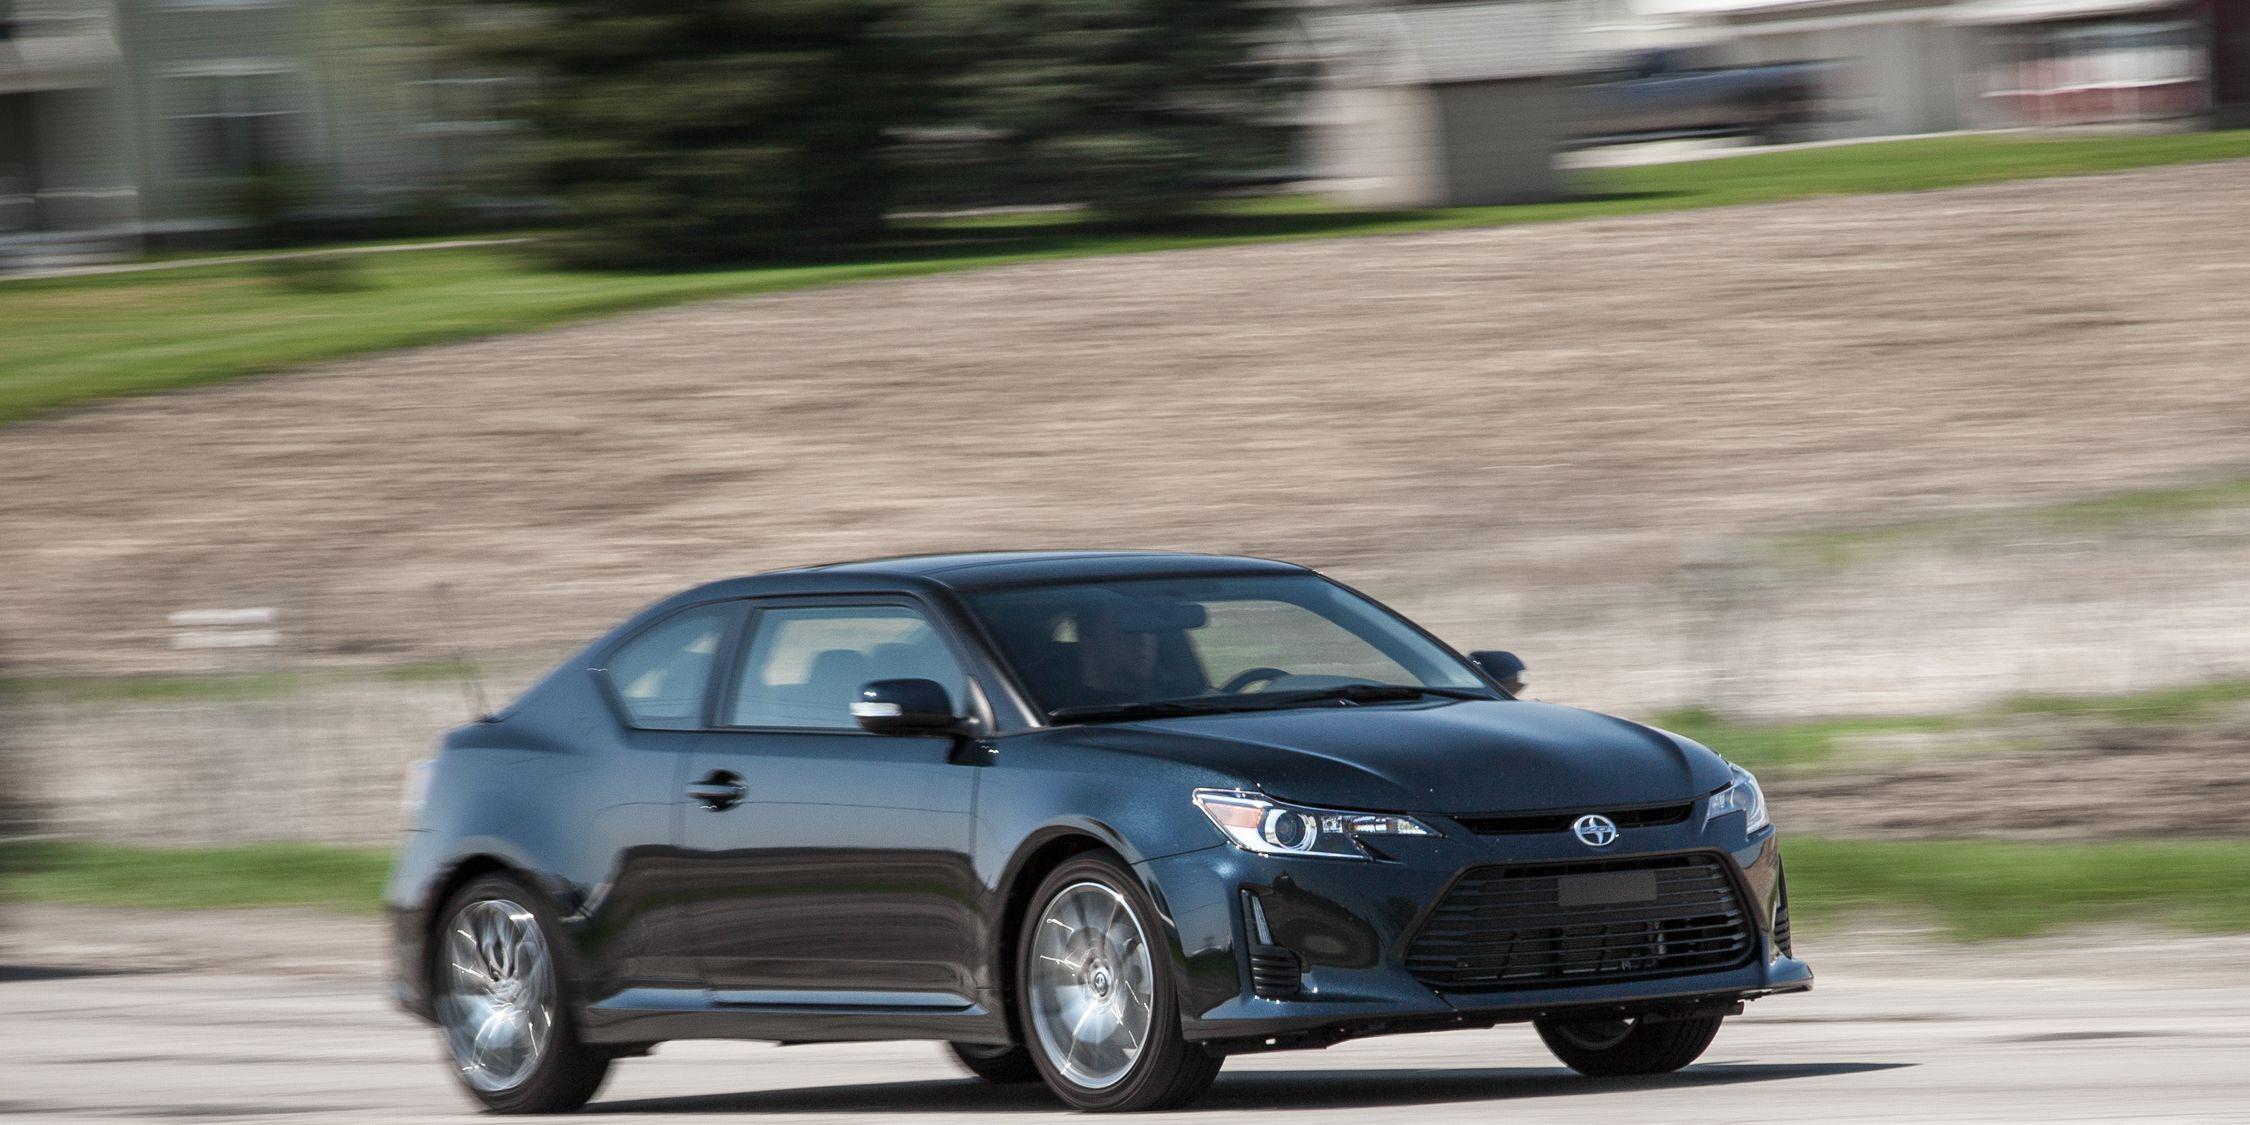 2016 Scion Tc Reviews Scion Tc Price Photos And Specs Car And